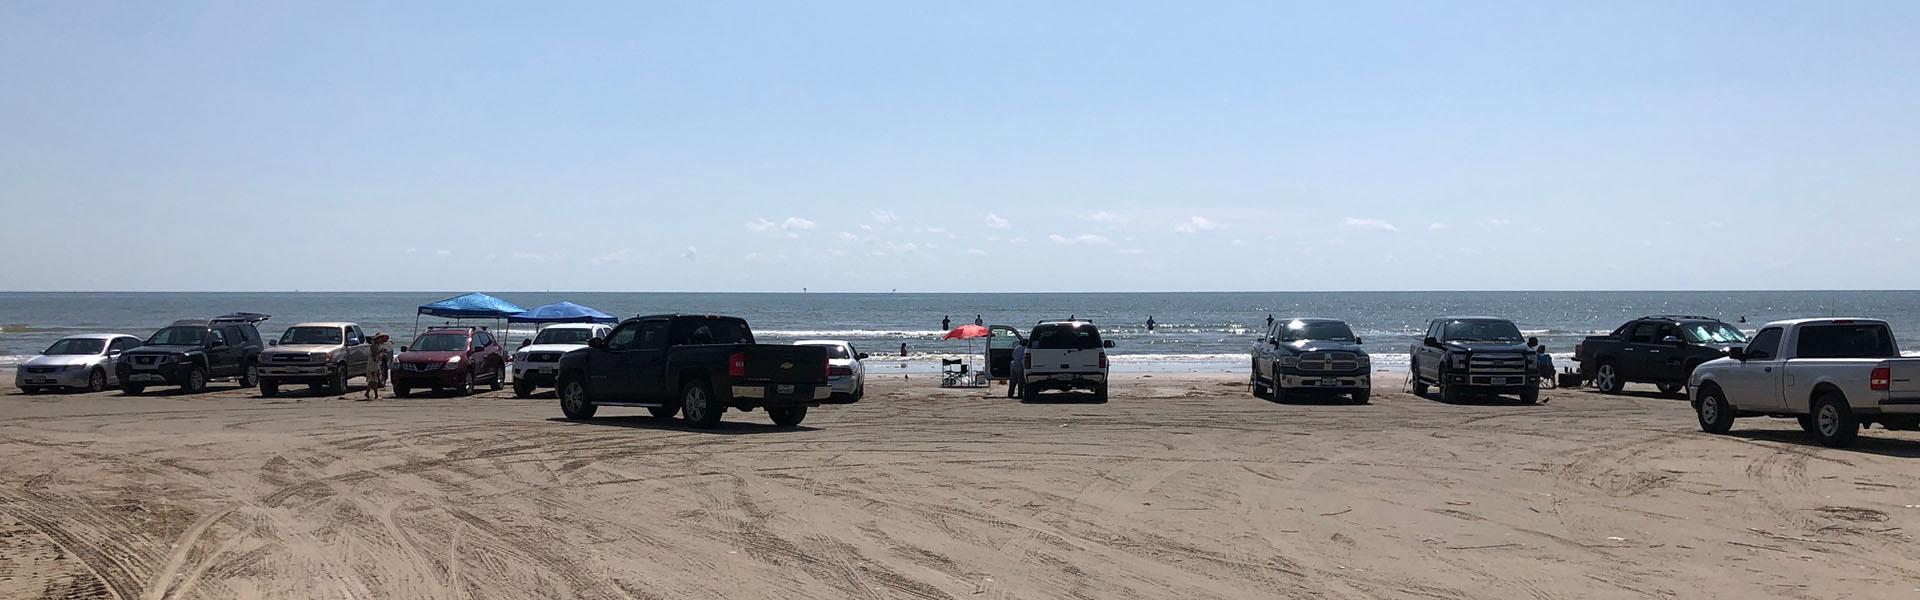 Beach Access Point 10 at Hershey Beach